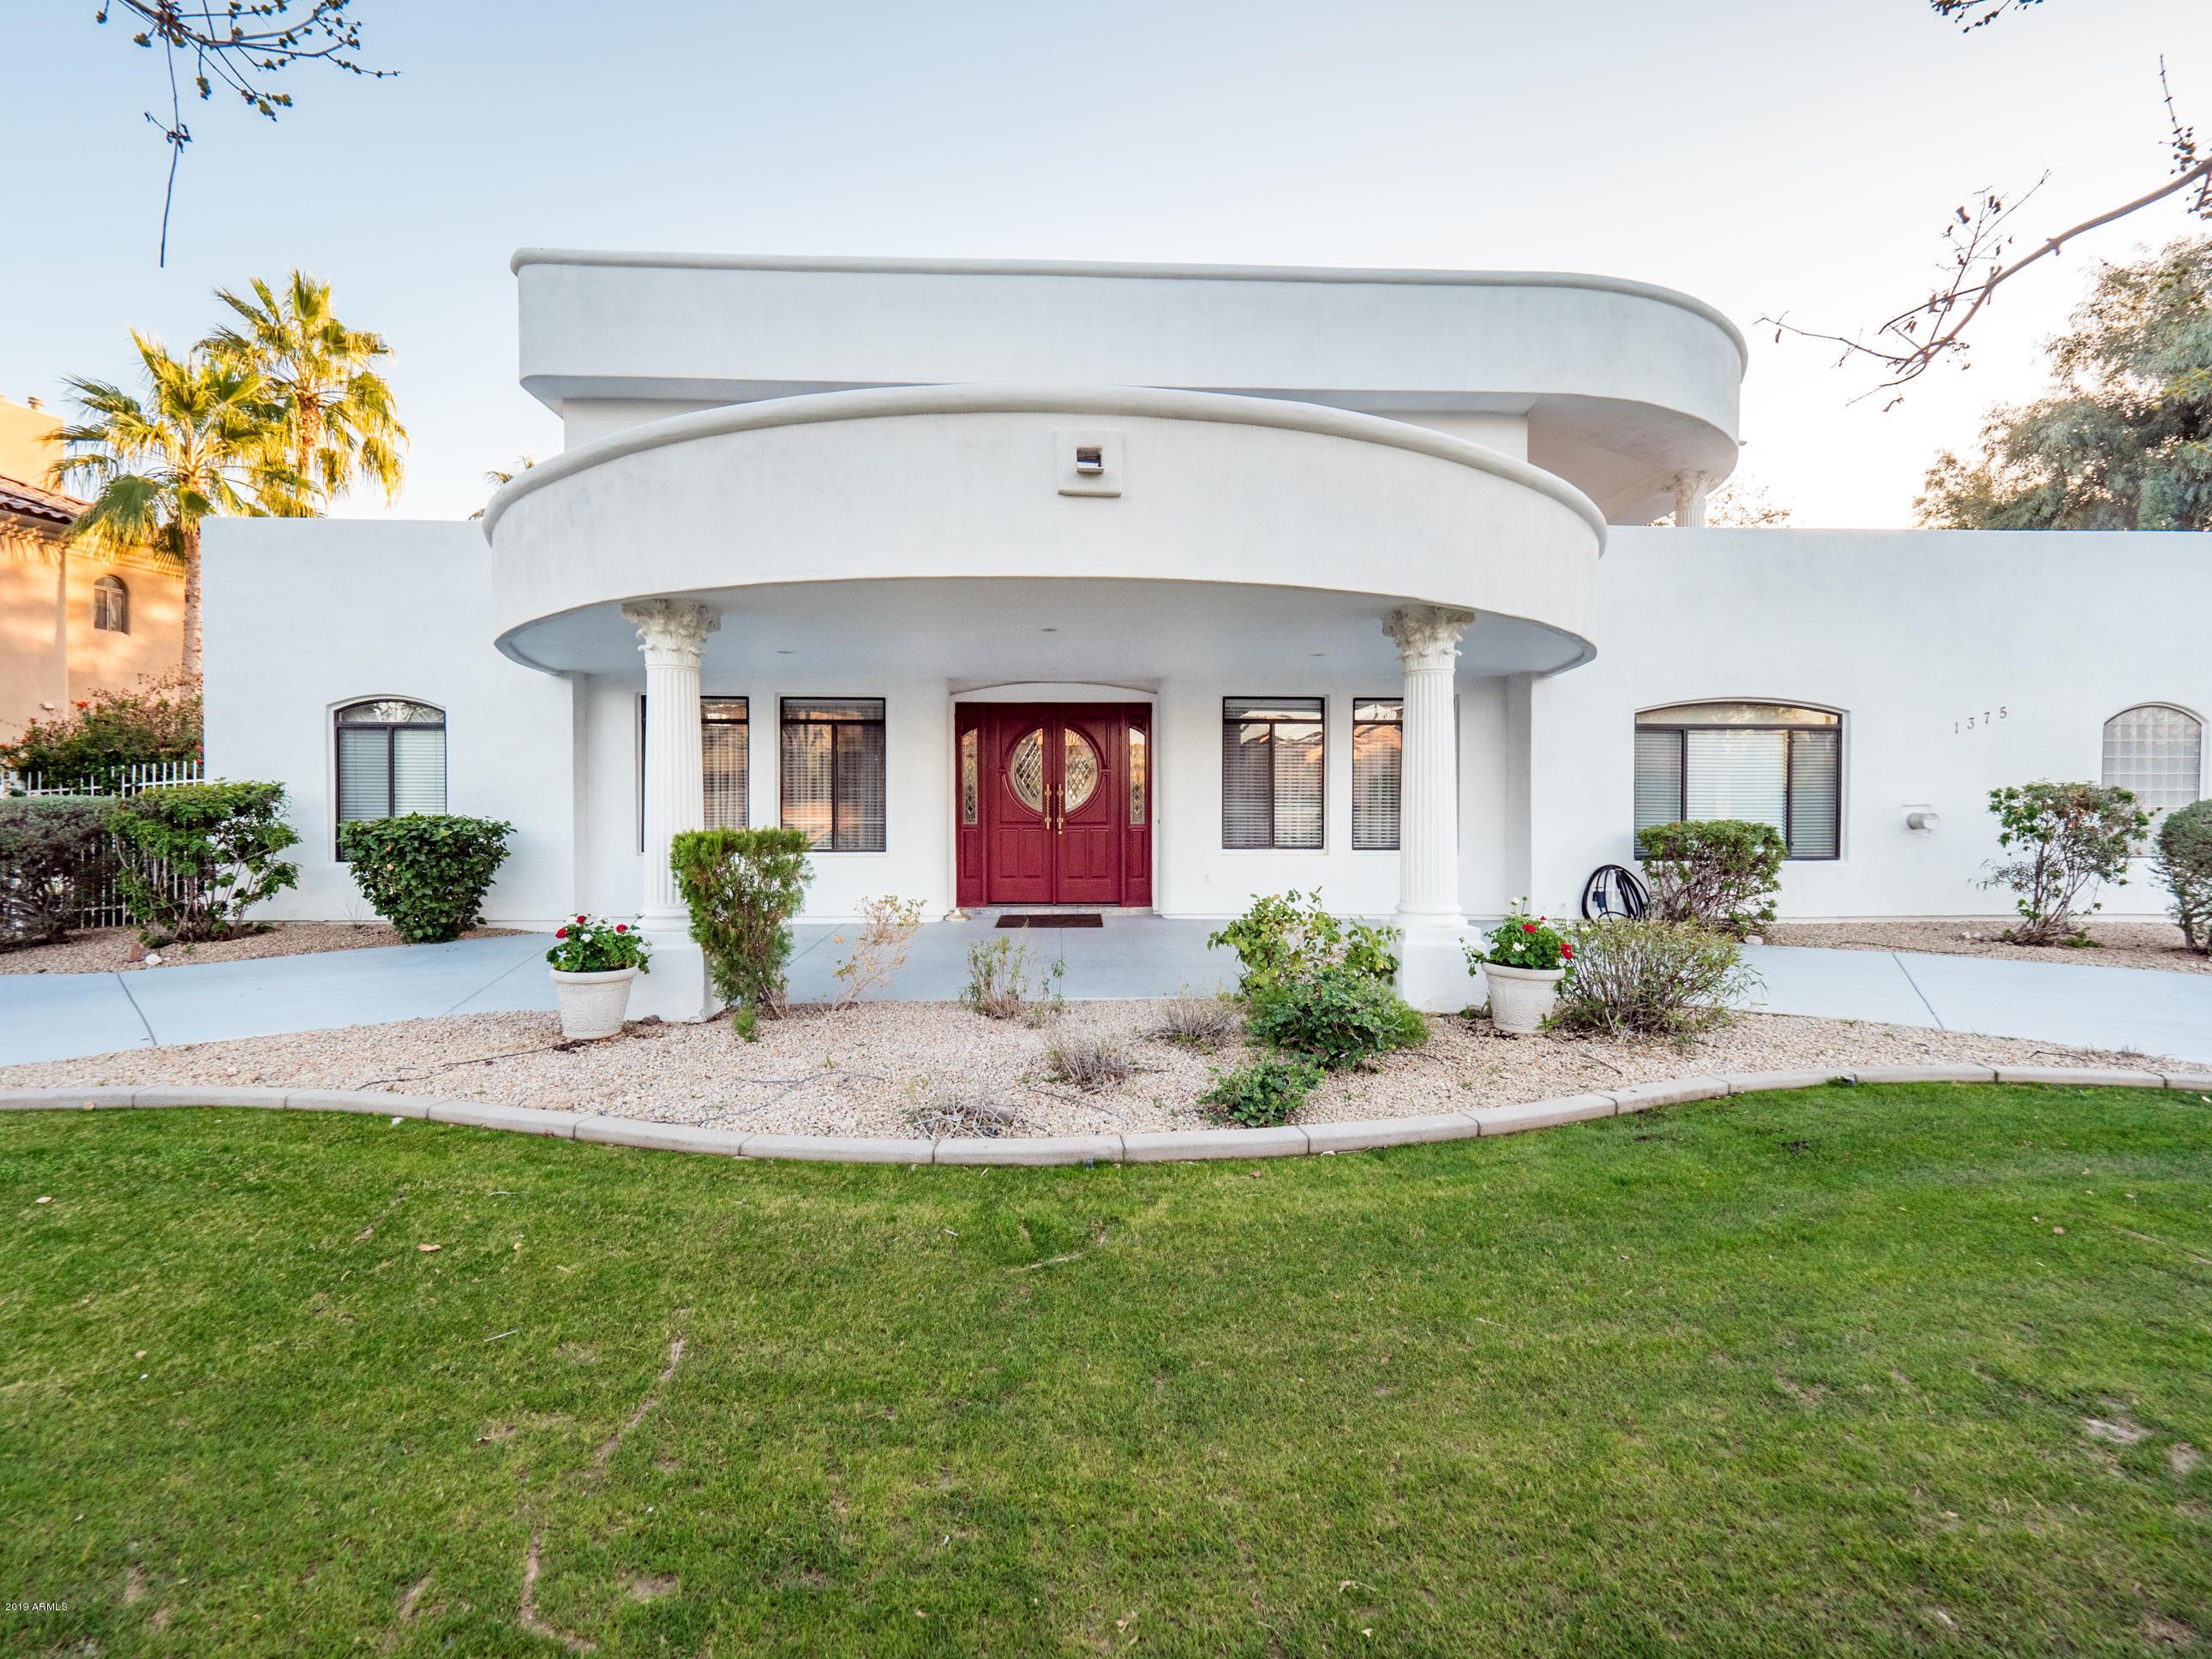 Photo of 1375 W ISLAND Circle, Chandler, AZ 85248